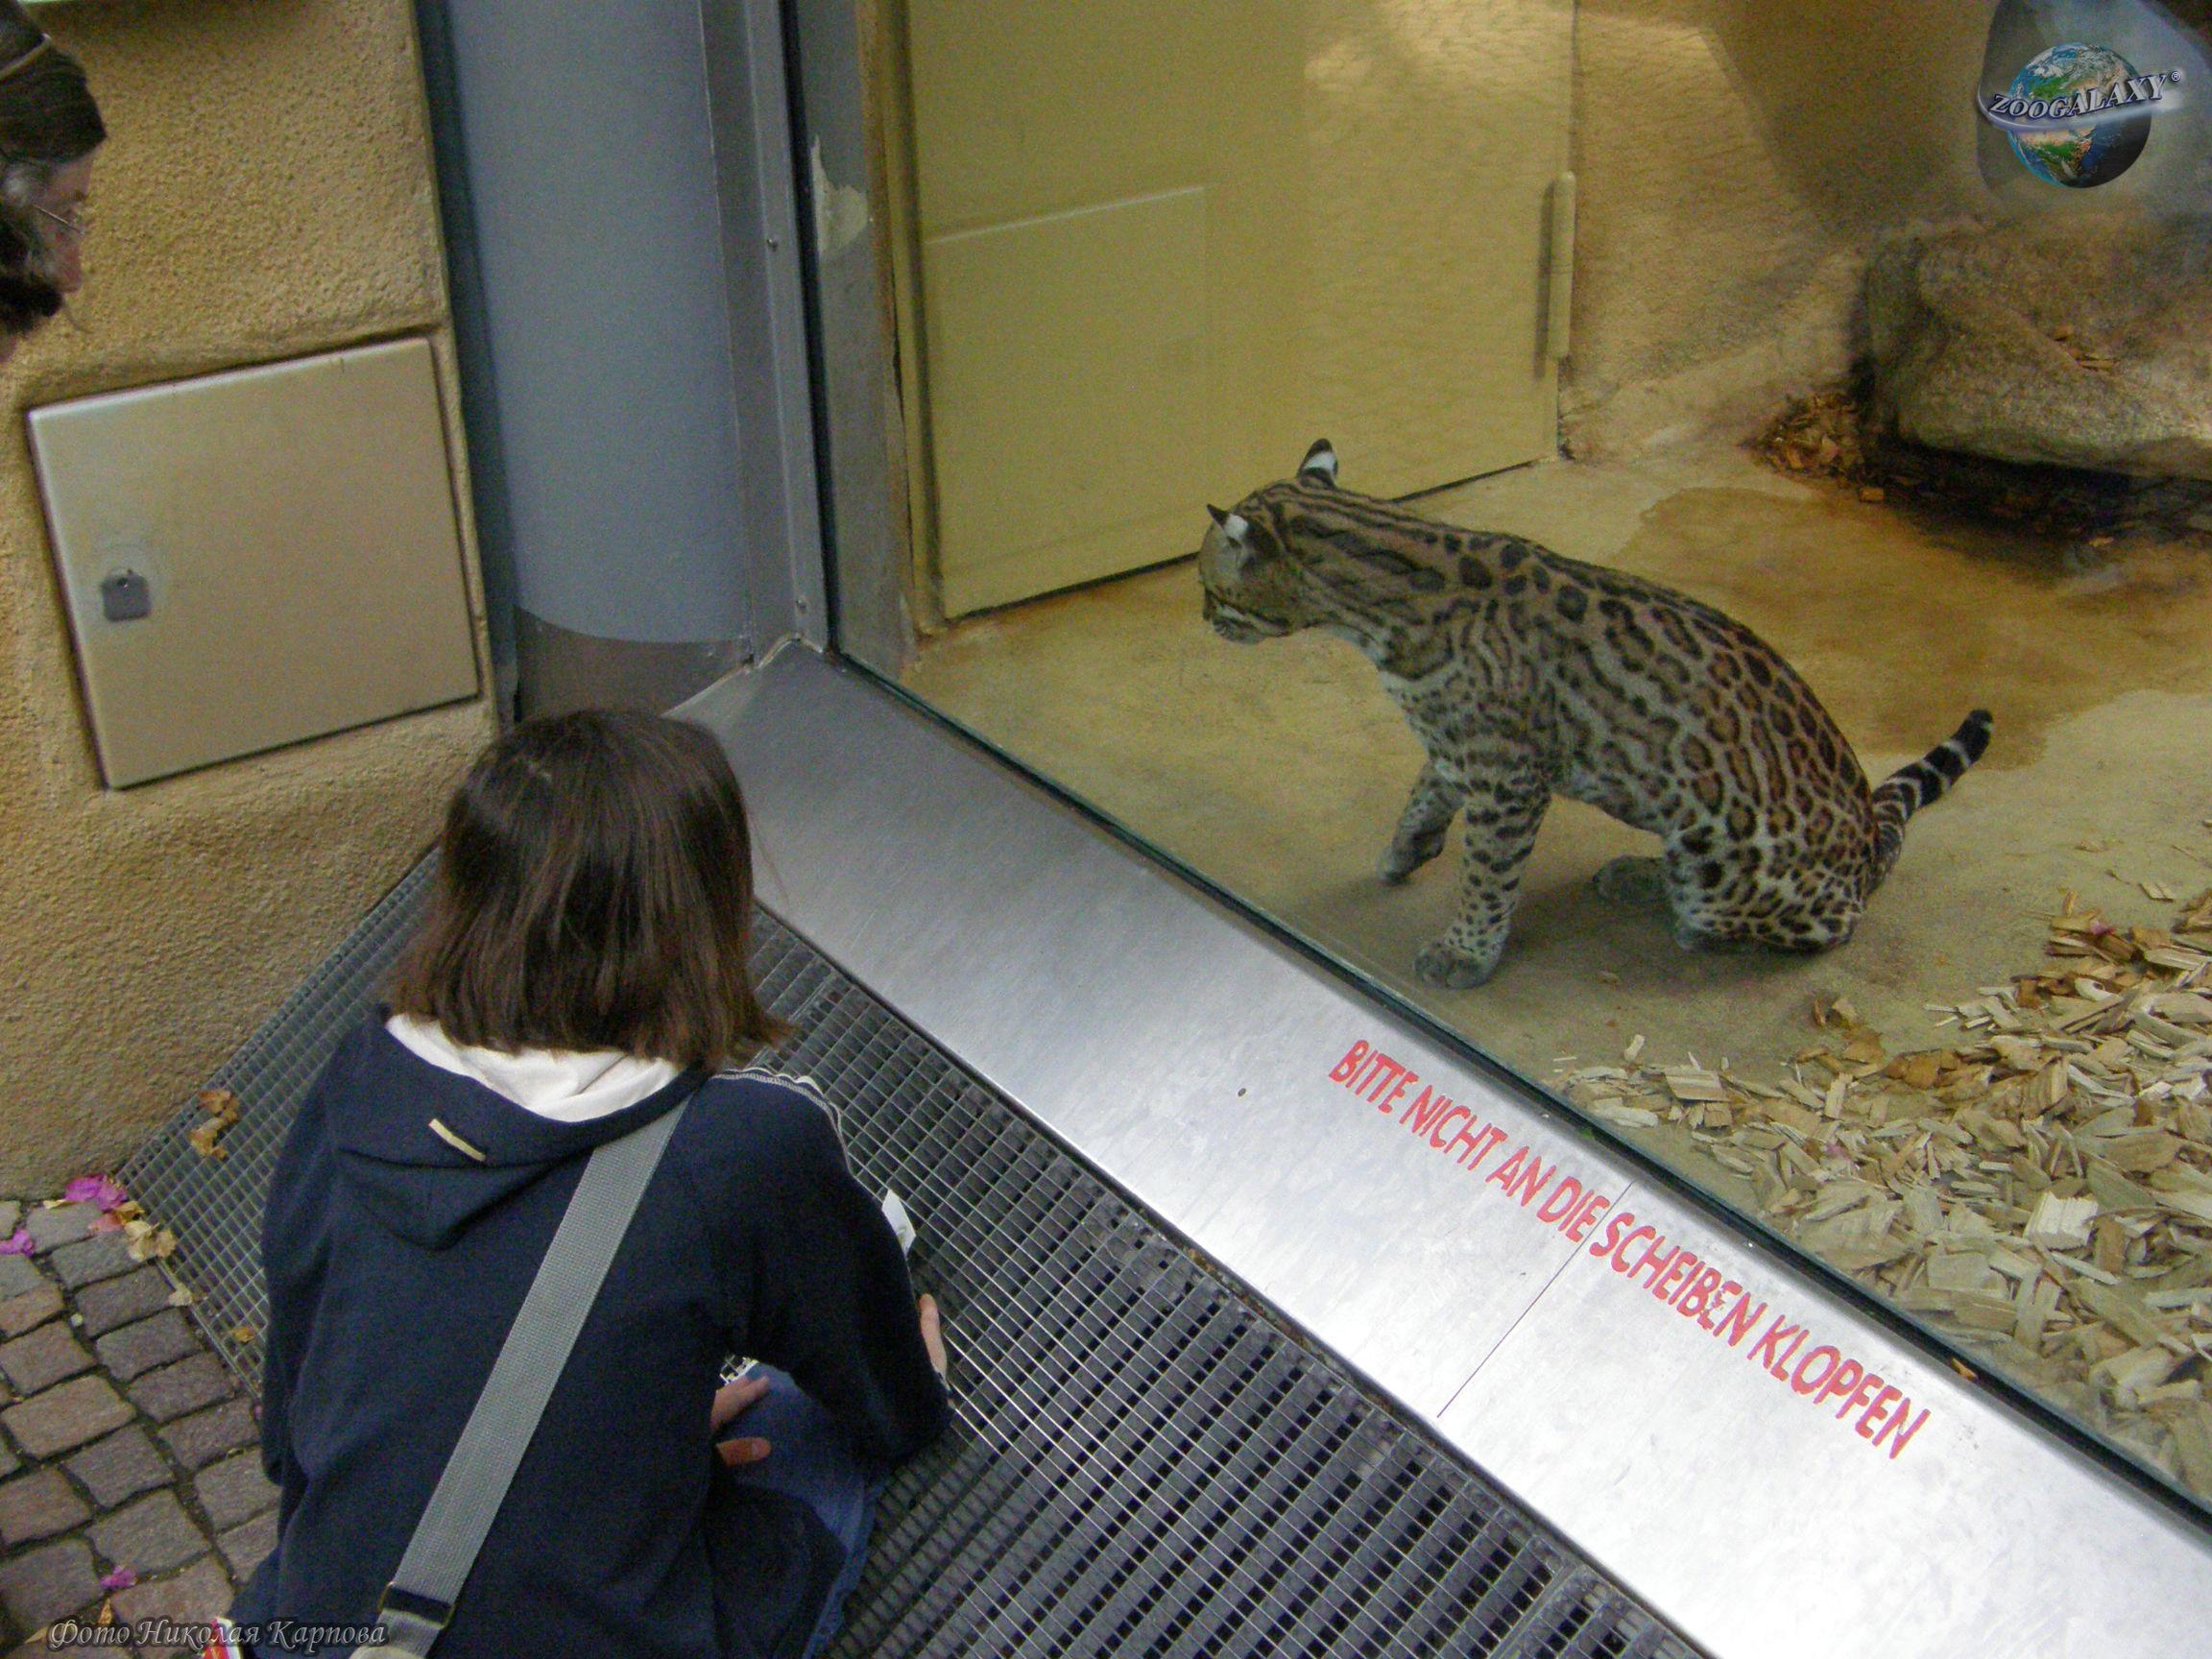 Ocelot | Photos and descriptions of animals | an educational